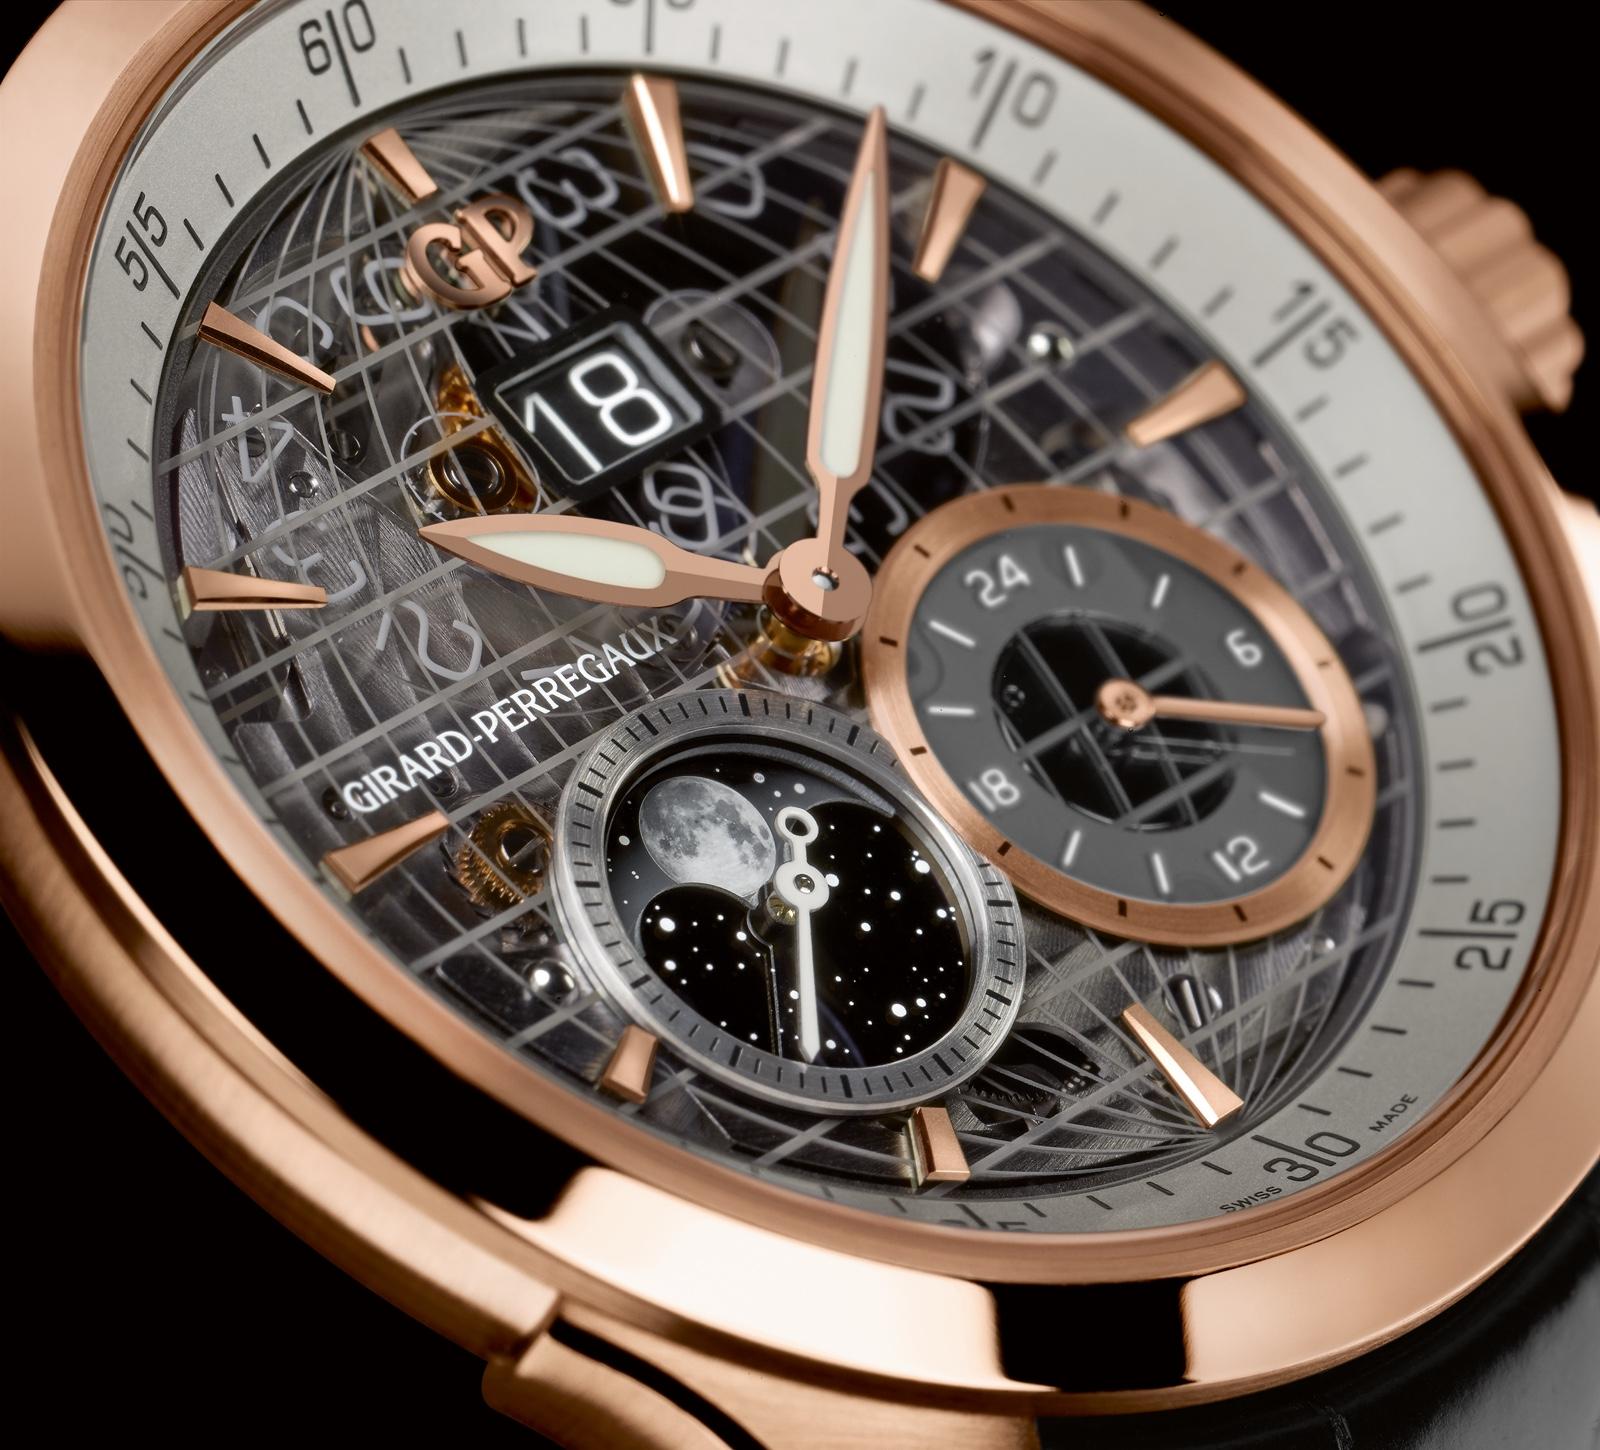 Girard-Perregaux Traveller GMT Detalle